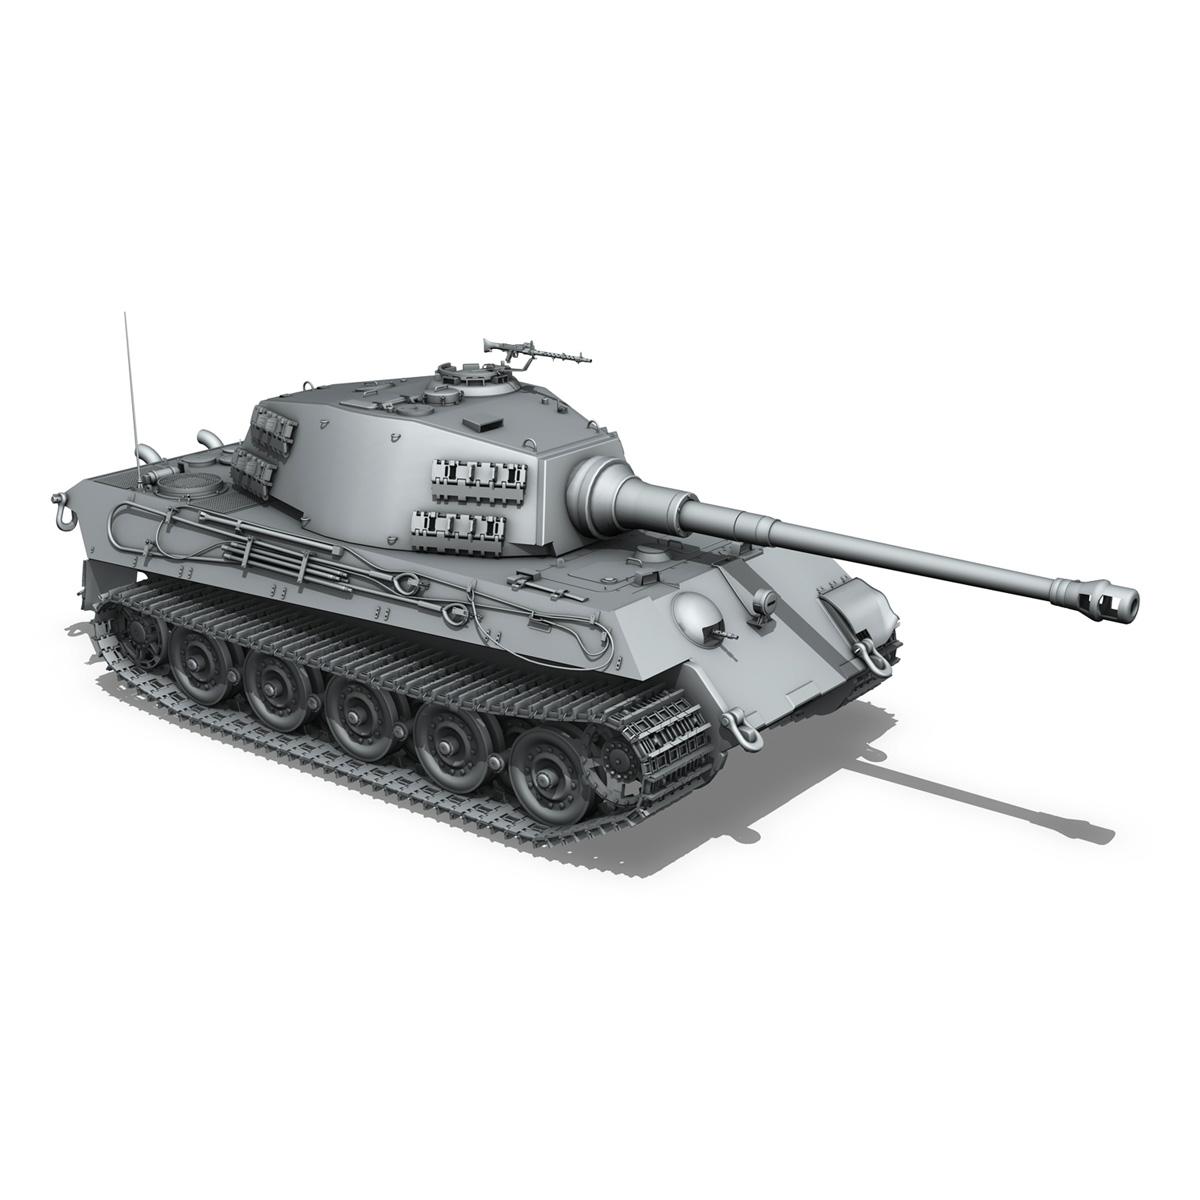 Panzerkampfwagen VI - Ausf B - Tiger II - 124 3d model 3ds c4d lwo lws lw obj 273764